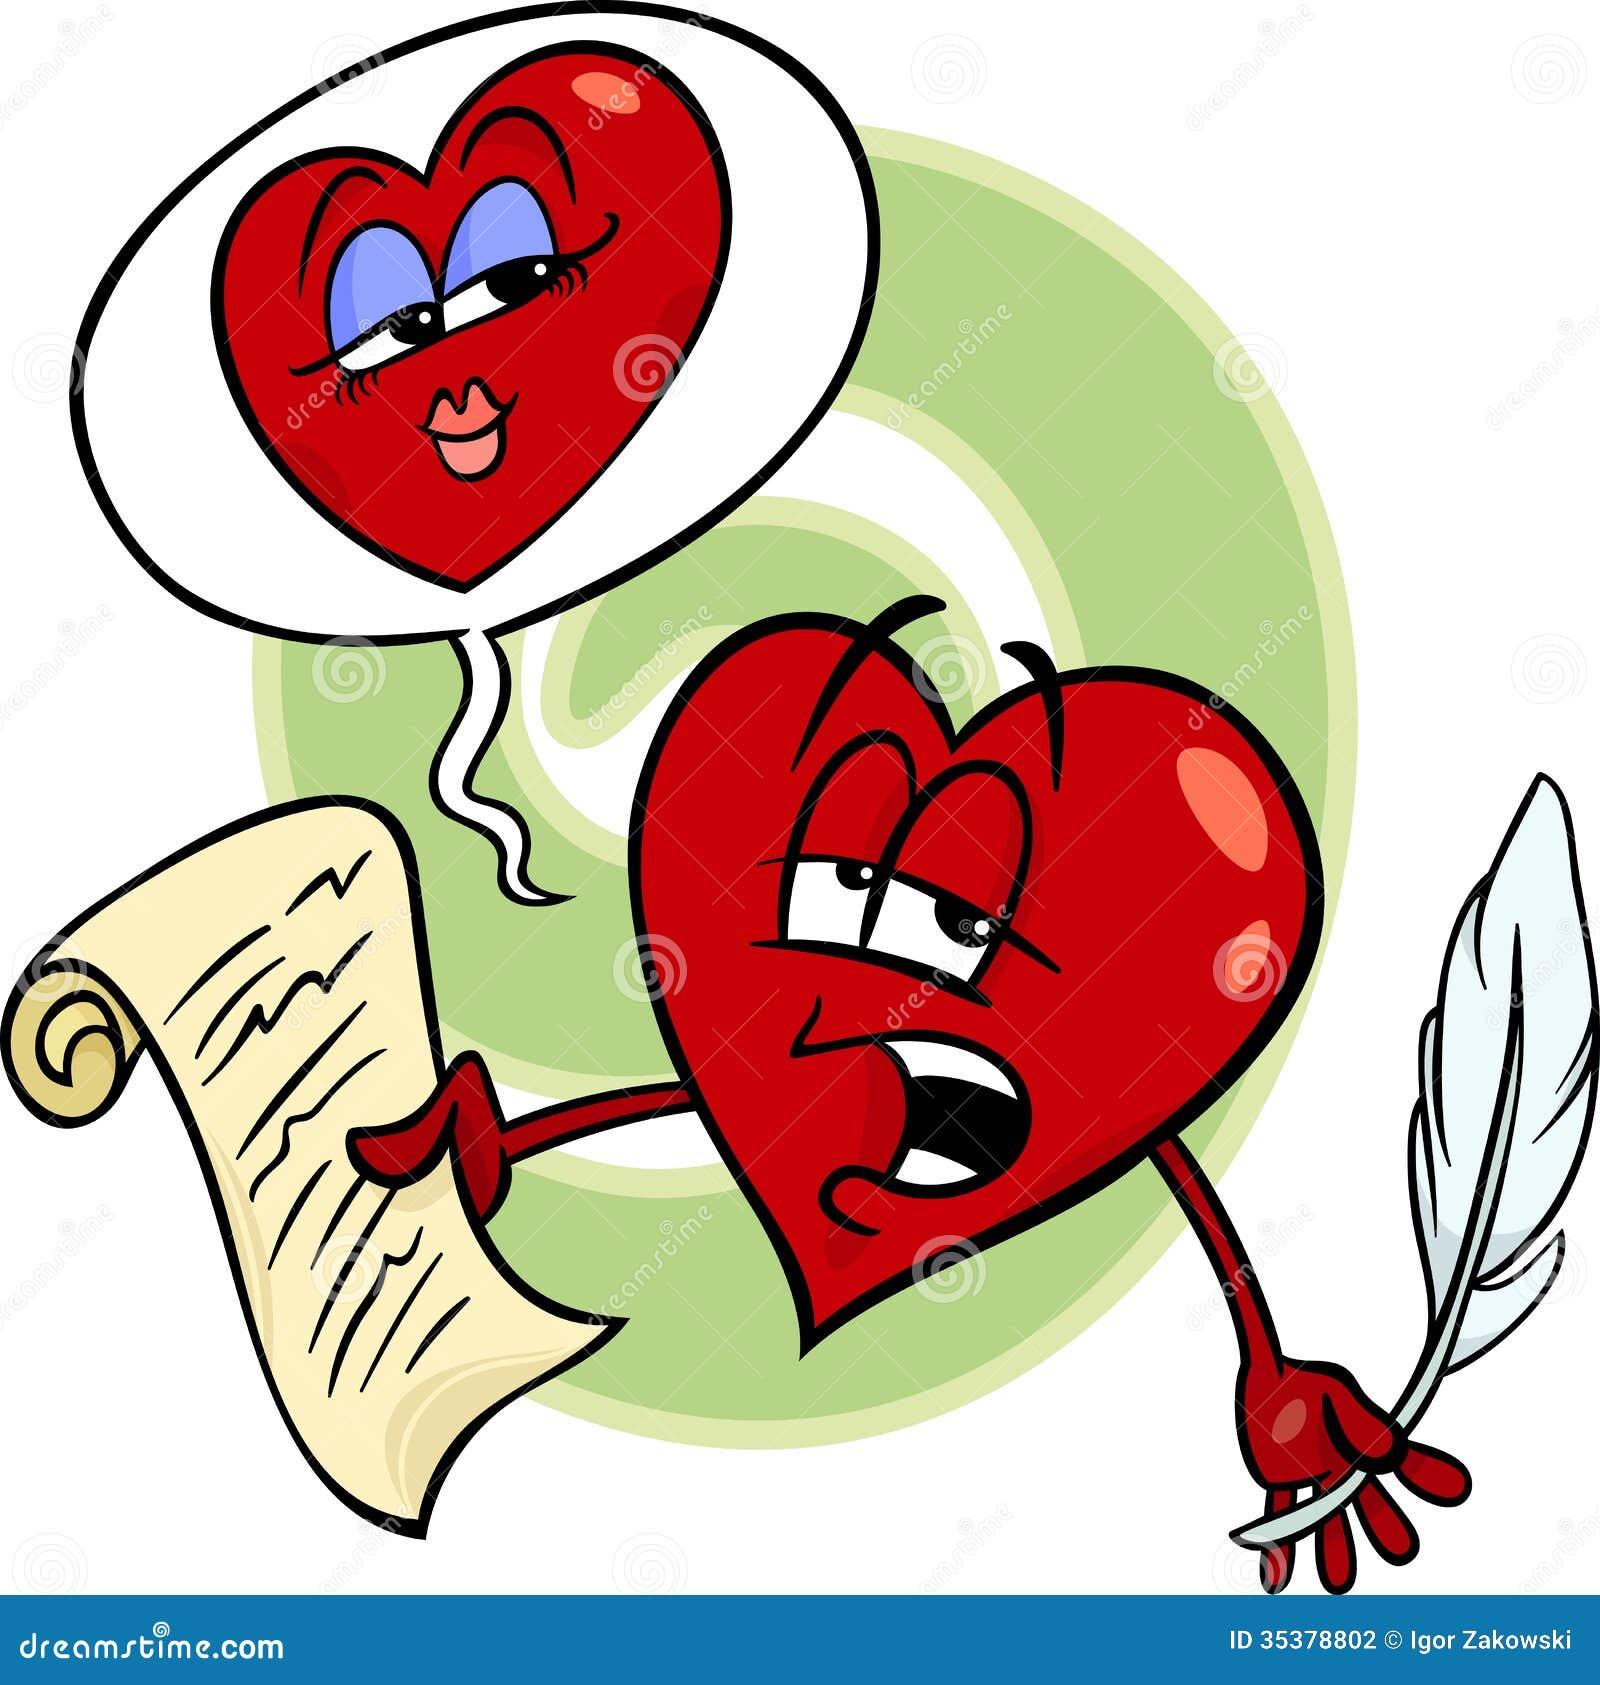 Cartoon illustration of heart poet character reading a love poem on